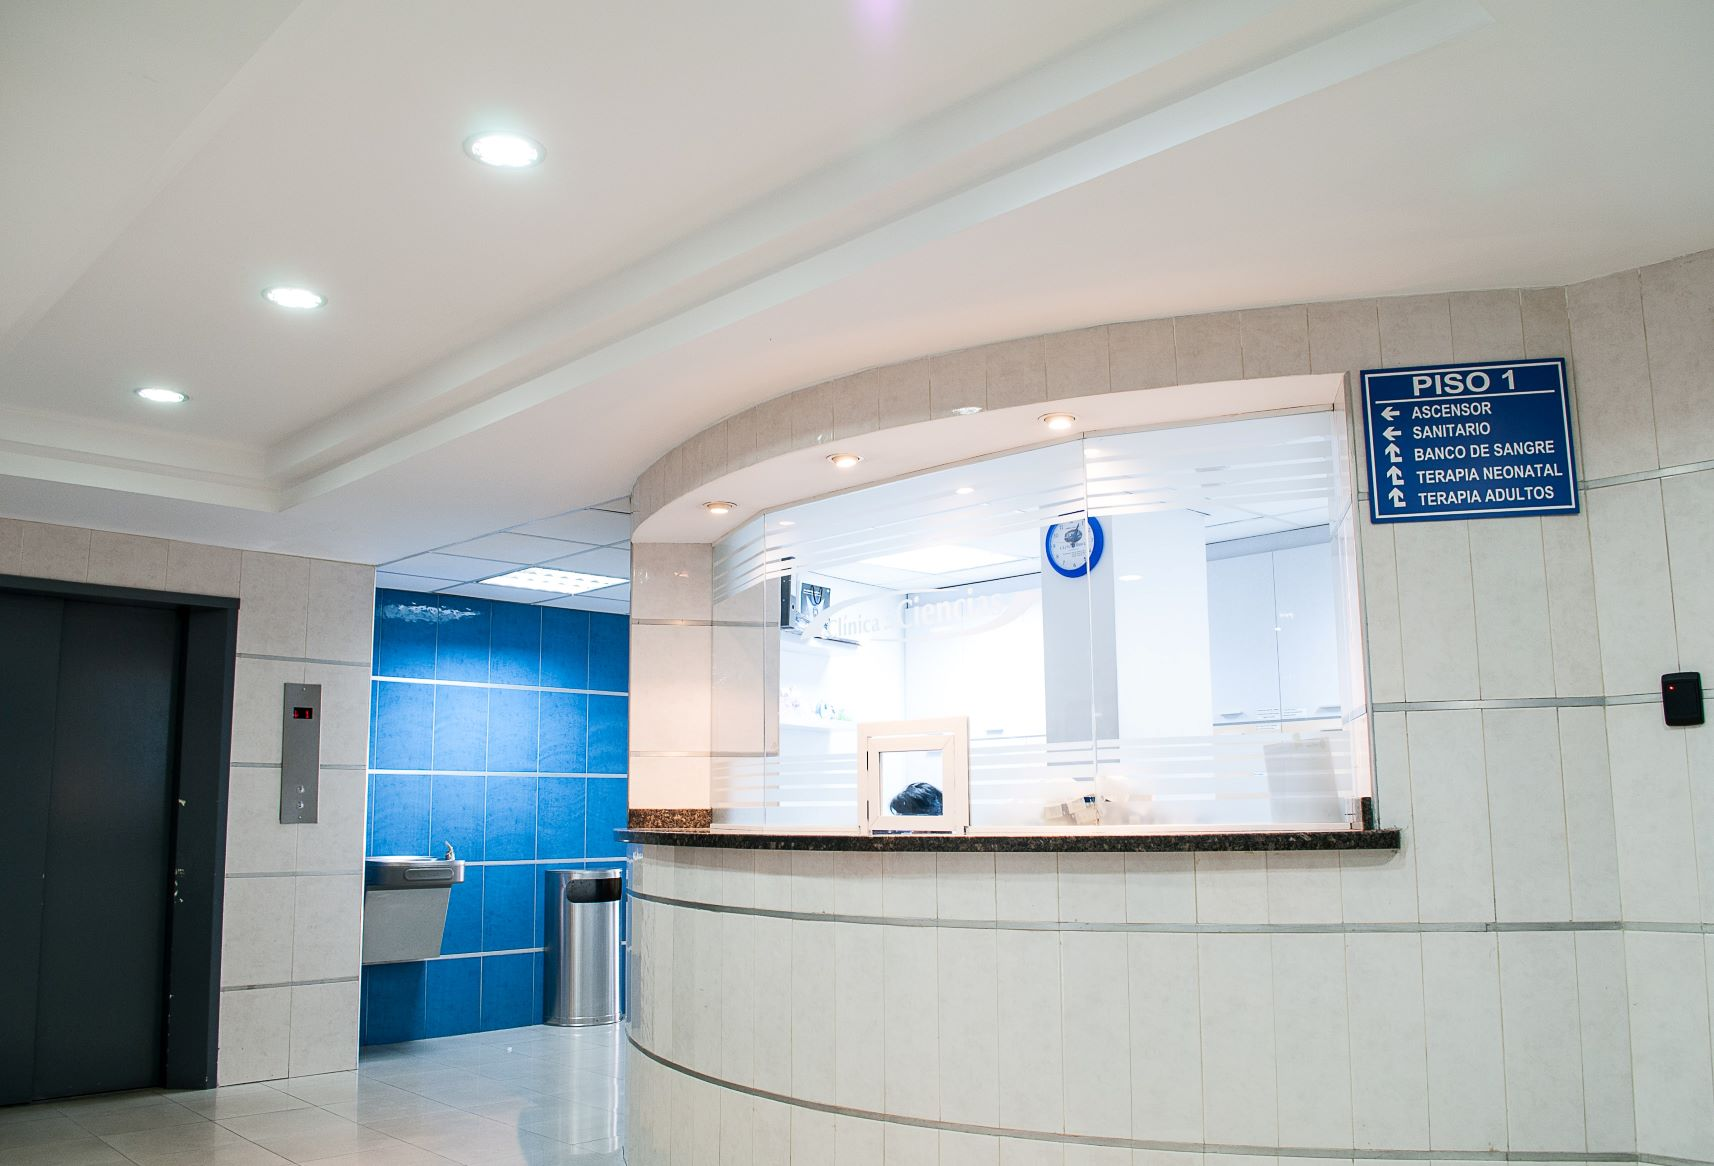 SimonsVoss Technologies - Hospitals' Access Control Checklist